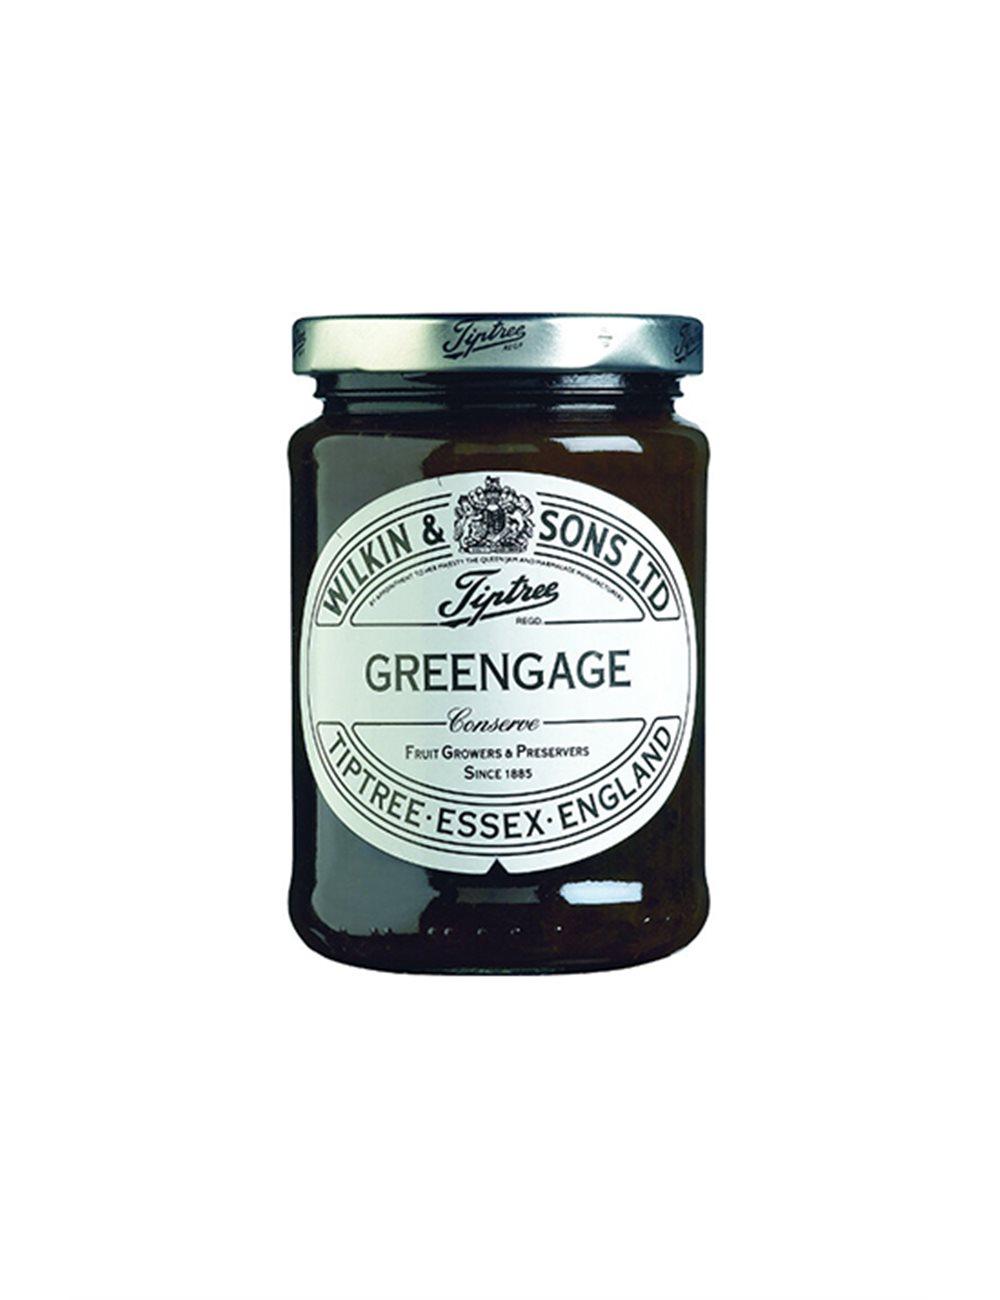 Greengage Conserve 340g